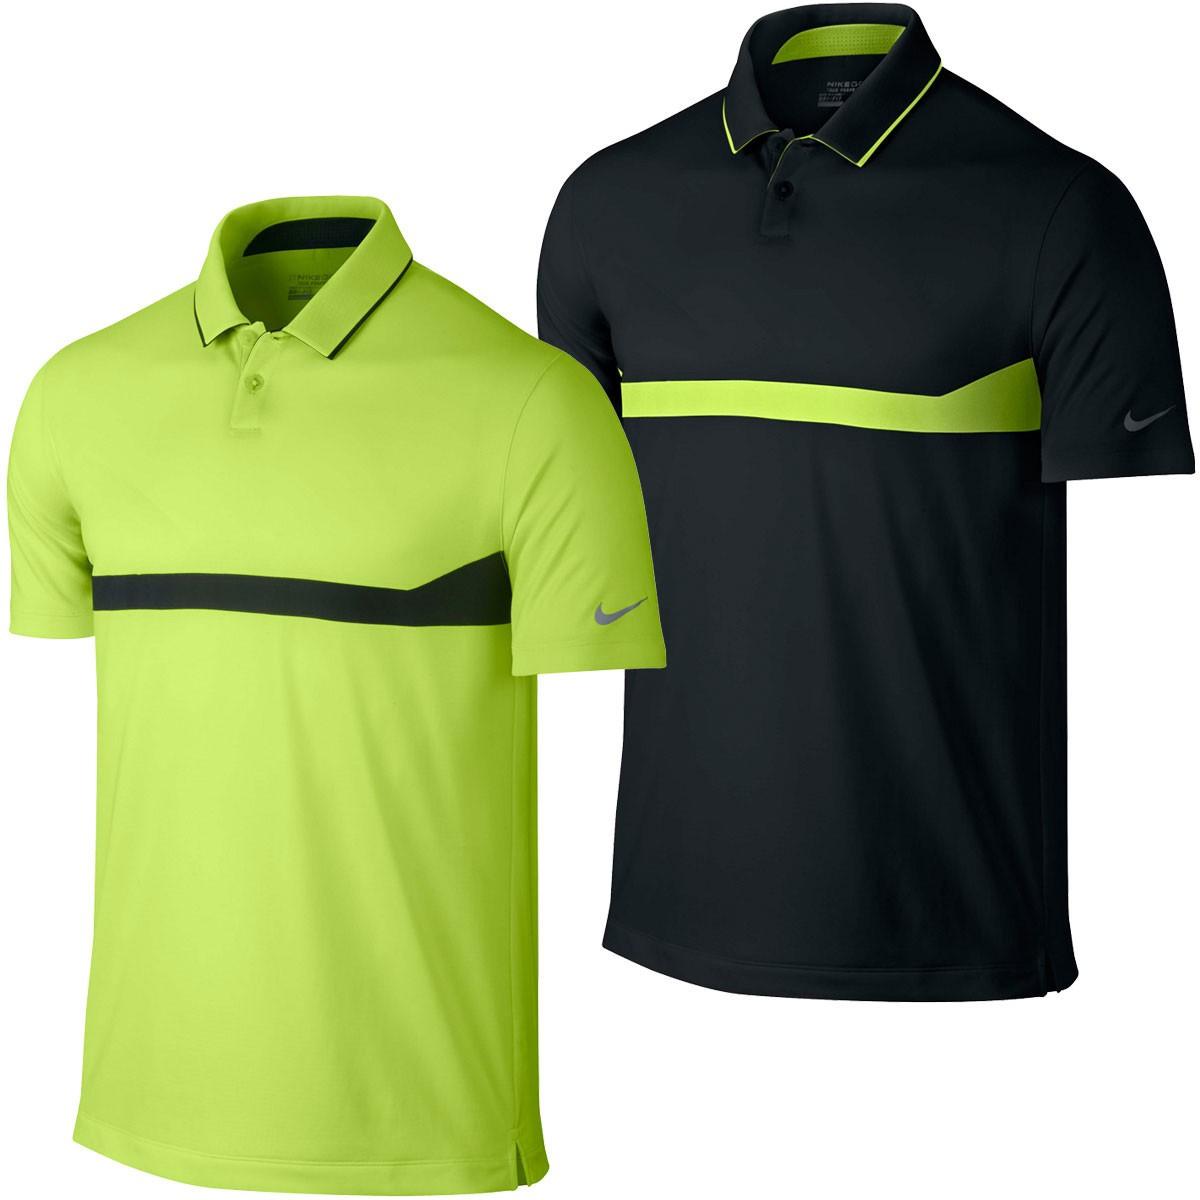 Nike golf mens major moment ace polo shirt for Nike golf mens polo shirts